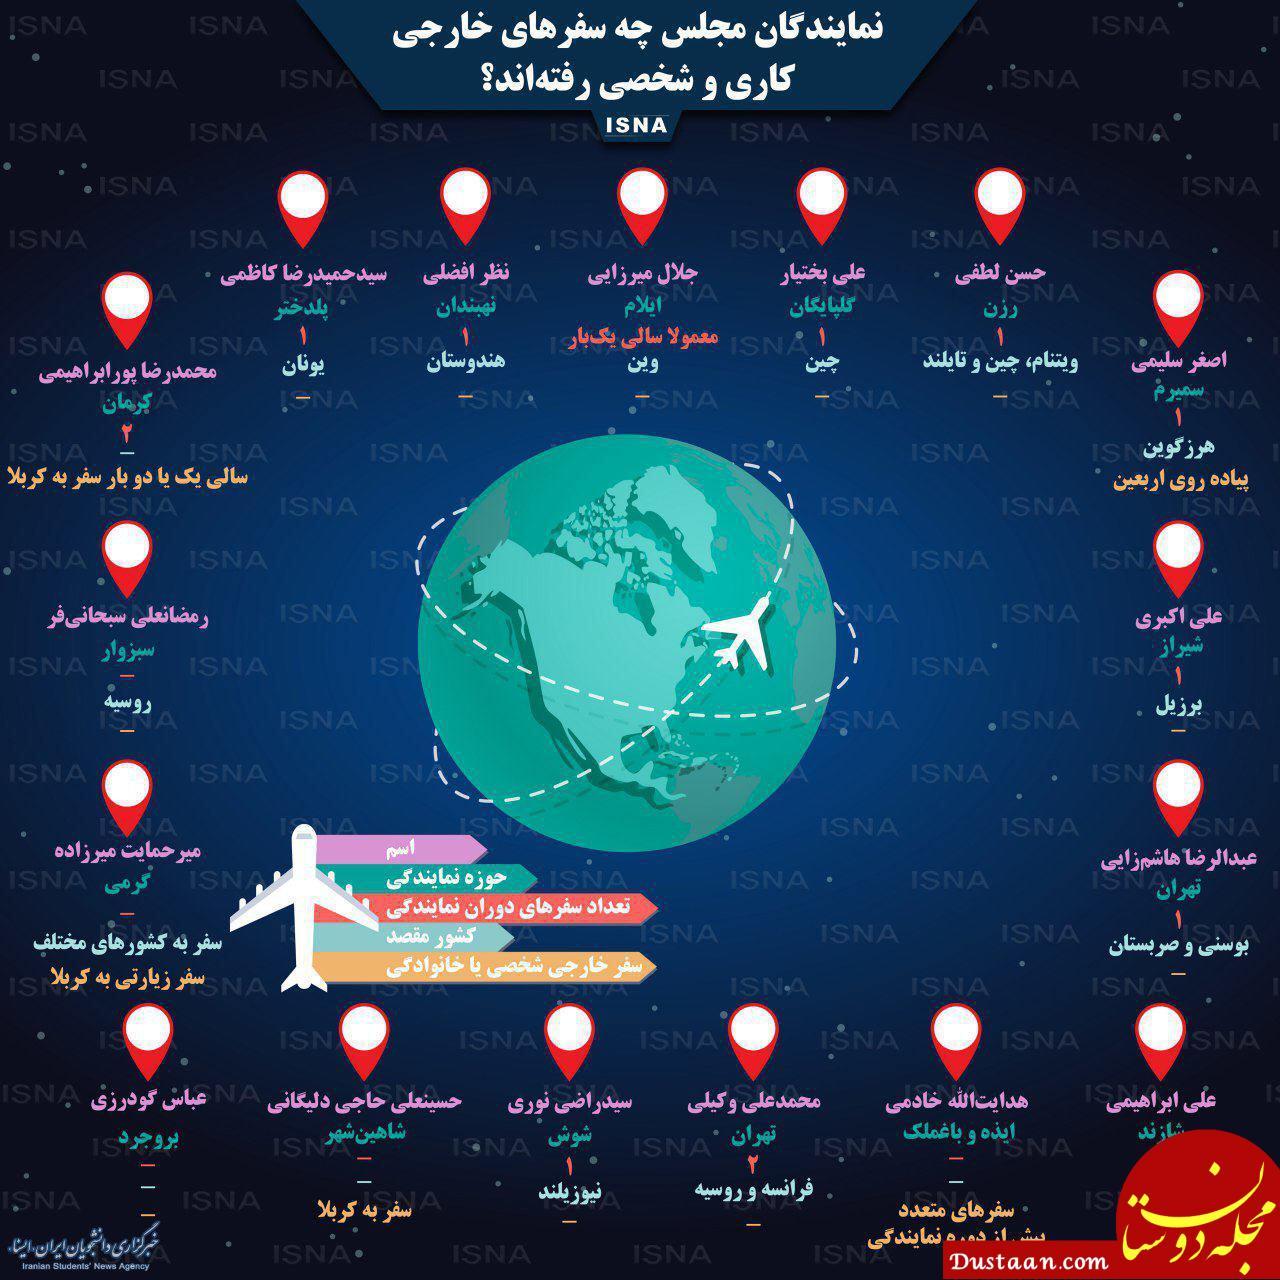 www.dustaan.com نمایندگان مجلس چه سفرهای خارجی کاری و شخصی رفته اند؟